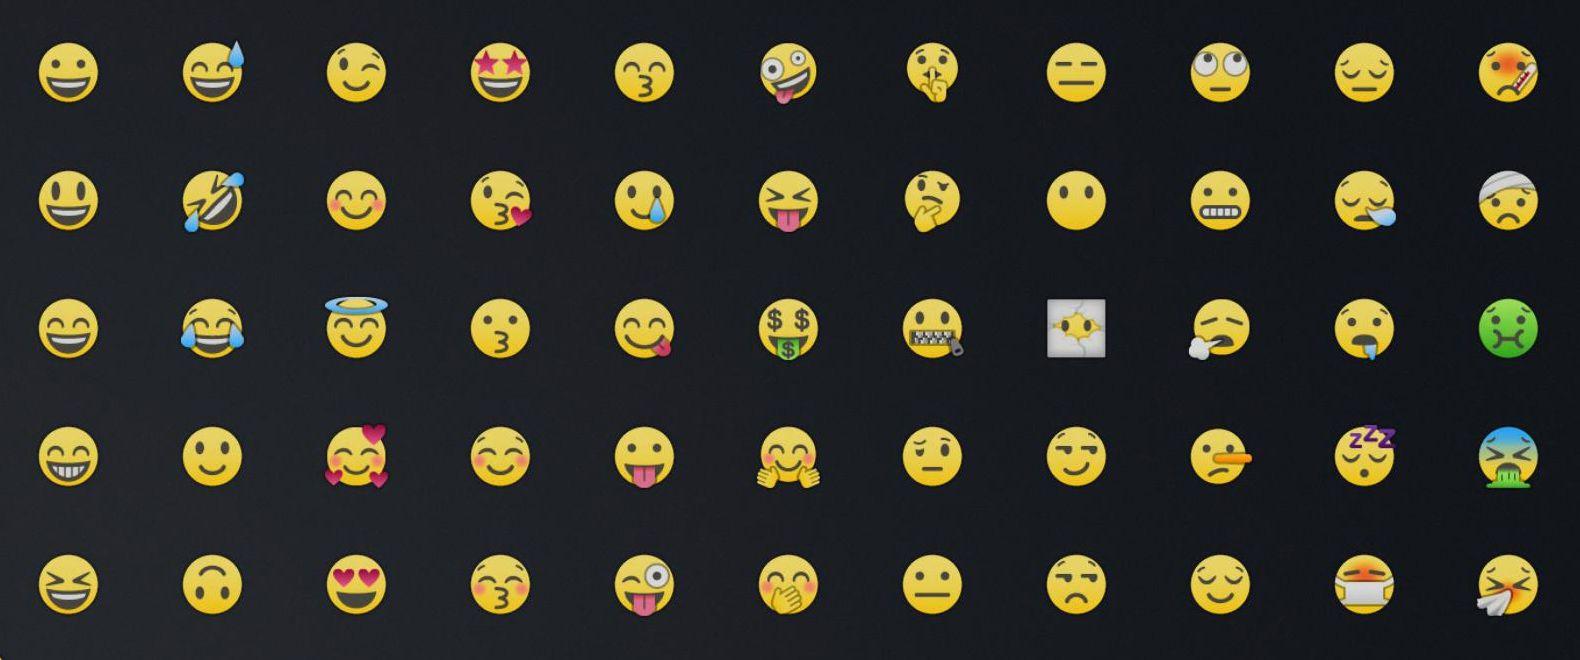 Emojipedia-Playstation-5-Messages-Emoji-Keyboard-1